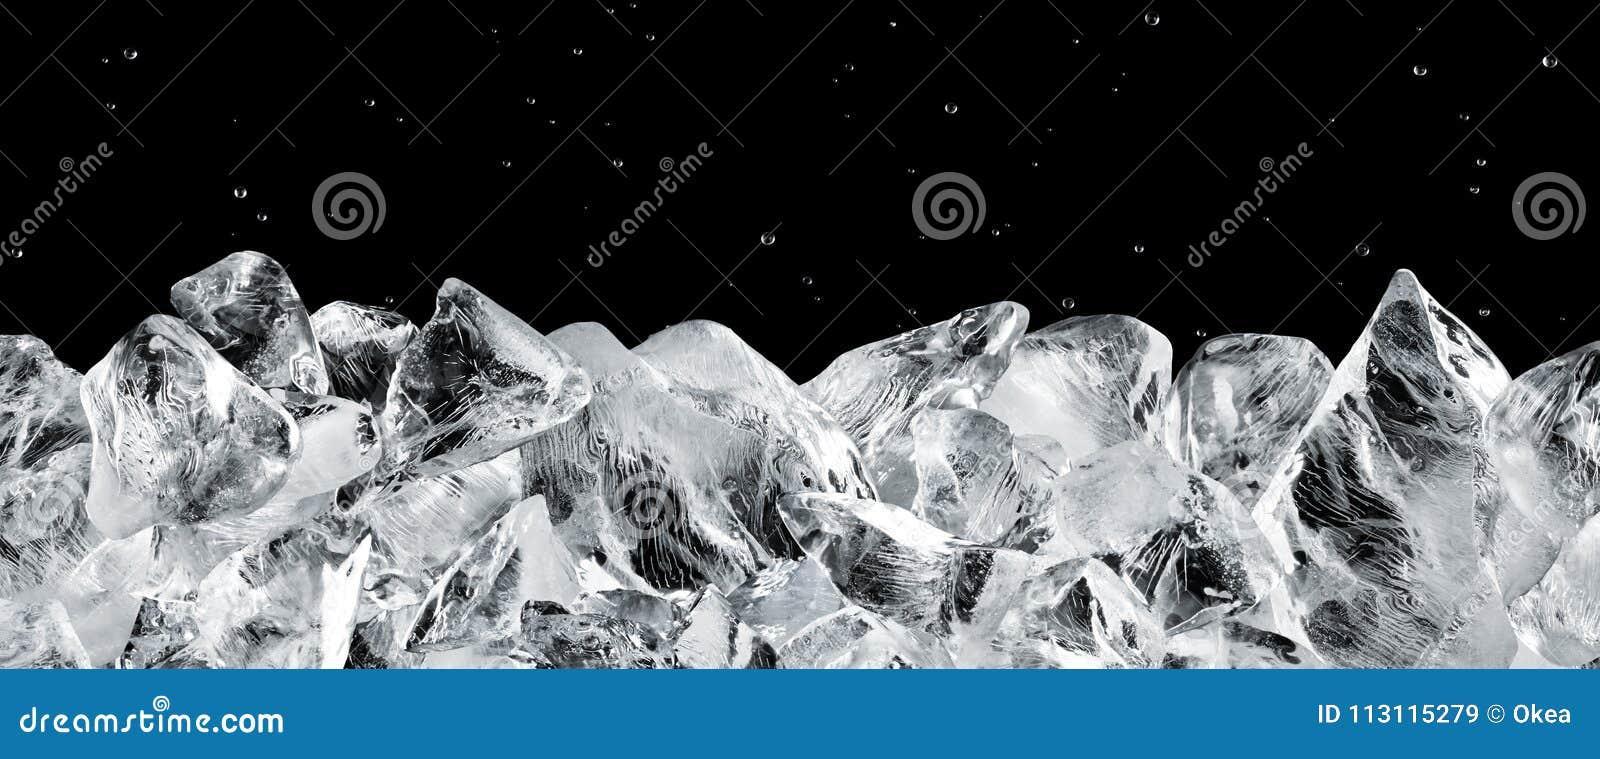 Download Ice blocks stock image. Image of cool, block, black - 113115279